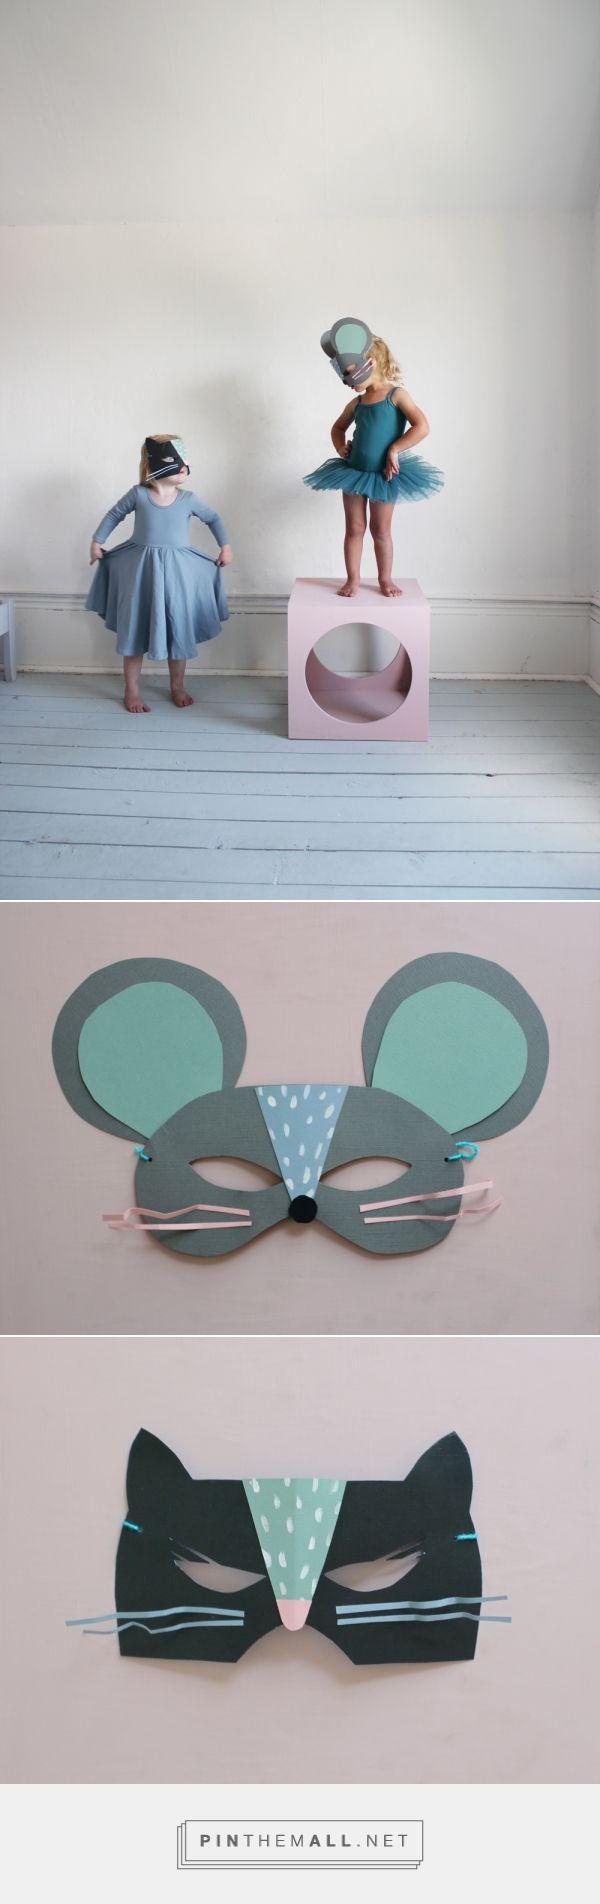 Mer Mag: DIY Paper Cat and Mouse Masks